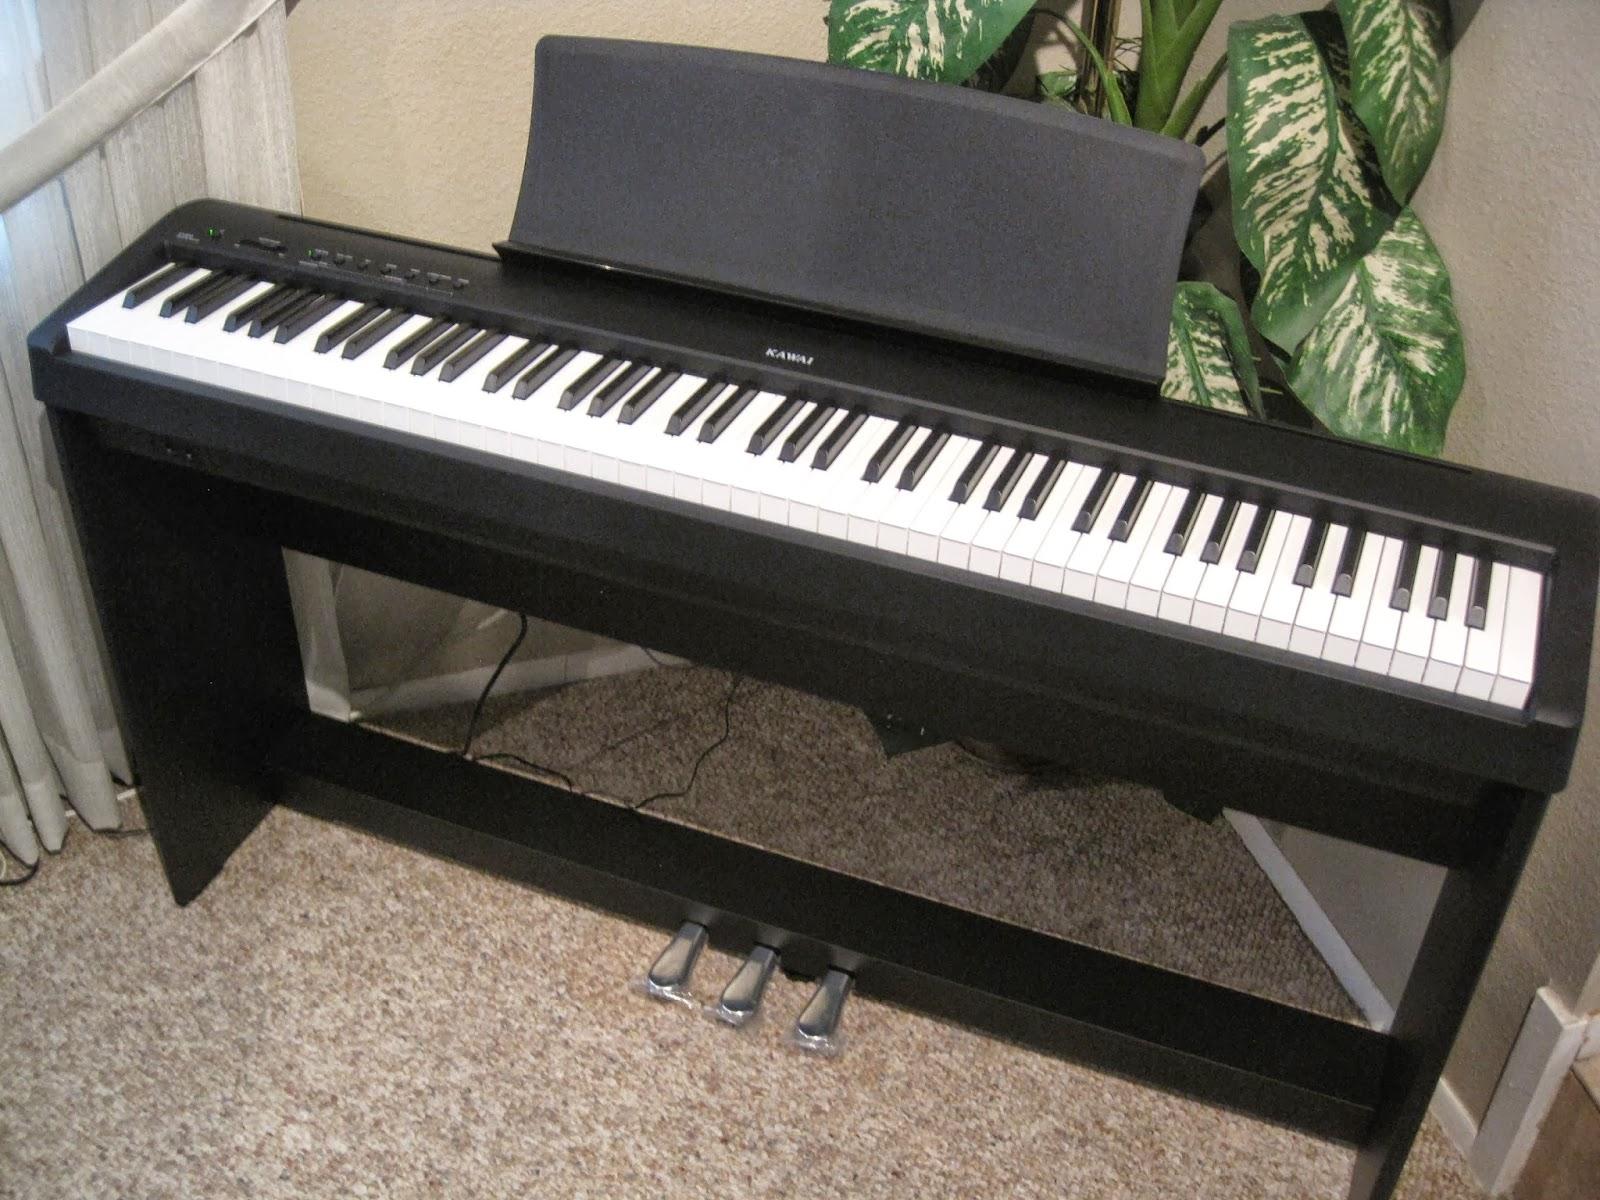 Az Piano Reviews Review Kawai Es100 Digital Piano